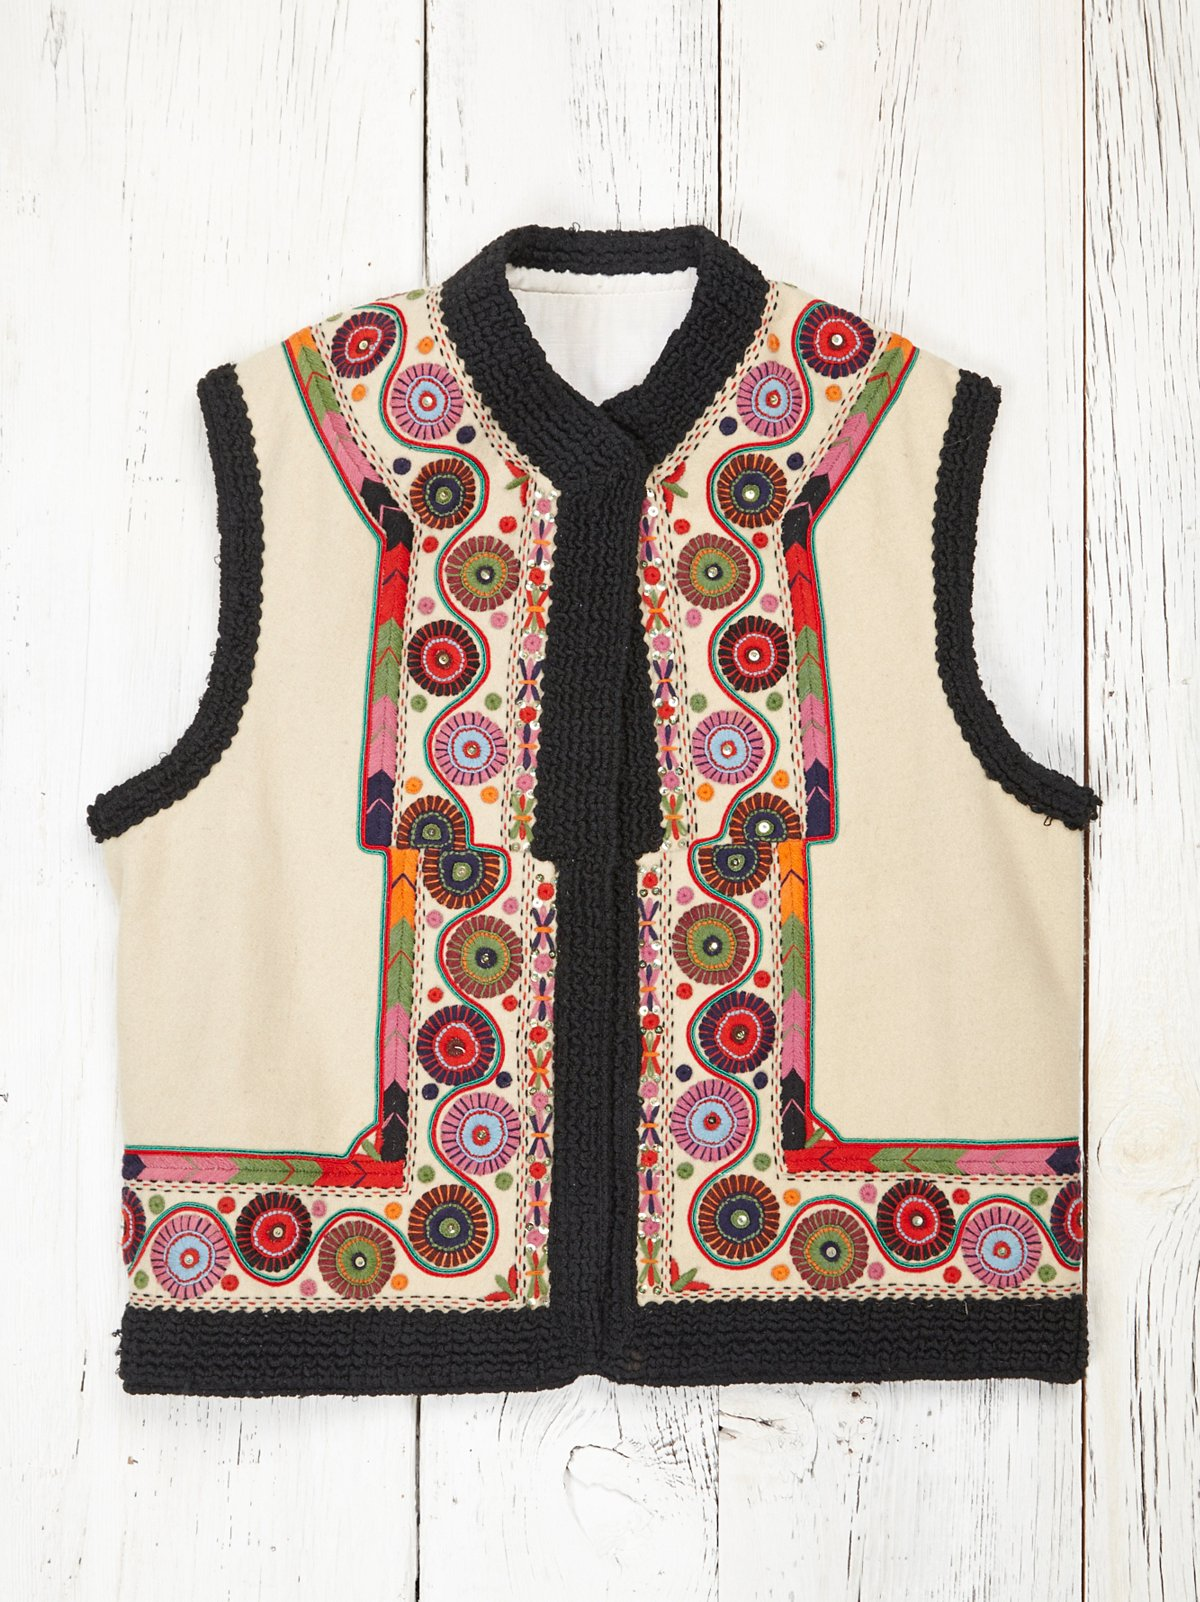 Vintage Embroidered Wool Vest